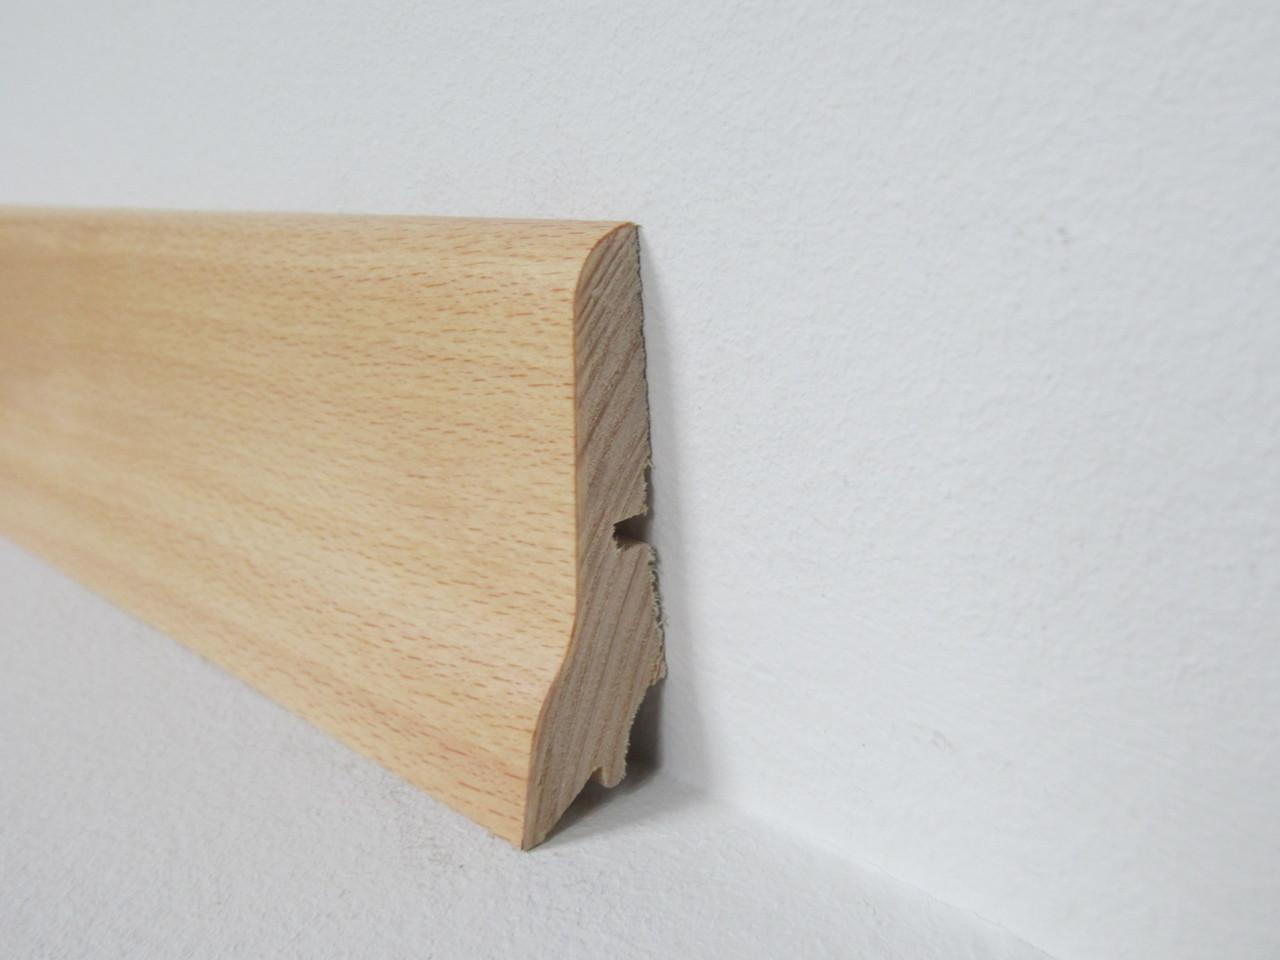 buche sockelleiste echtholz furniert leisten more shop. Black Bedroom Furniture Sets. Home Design Ideas